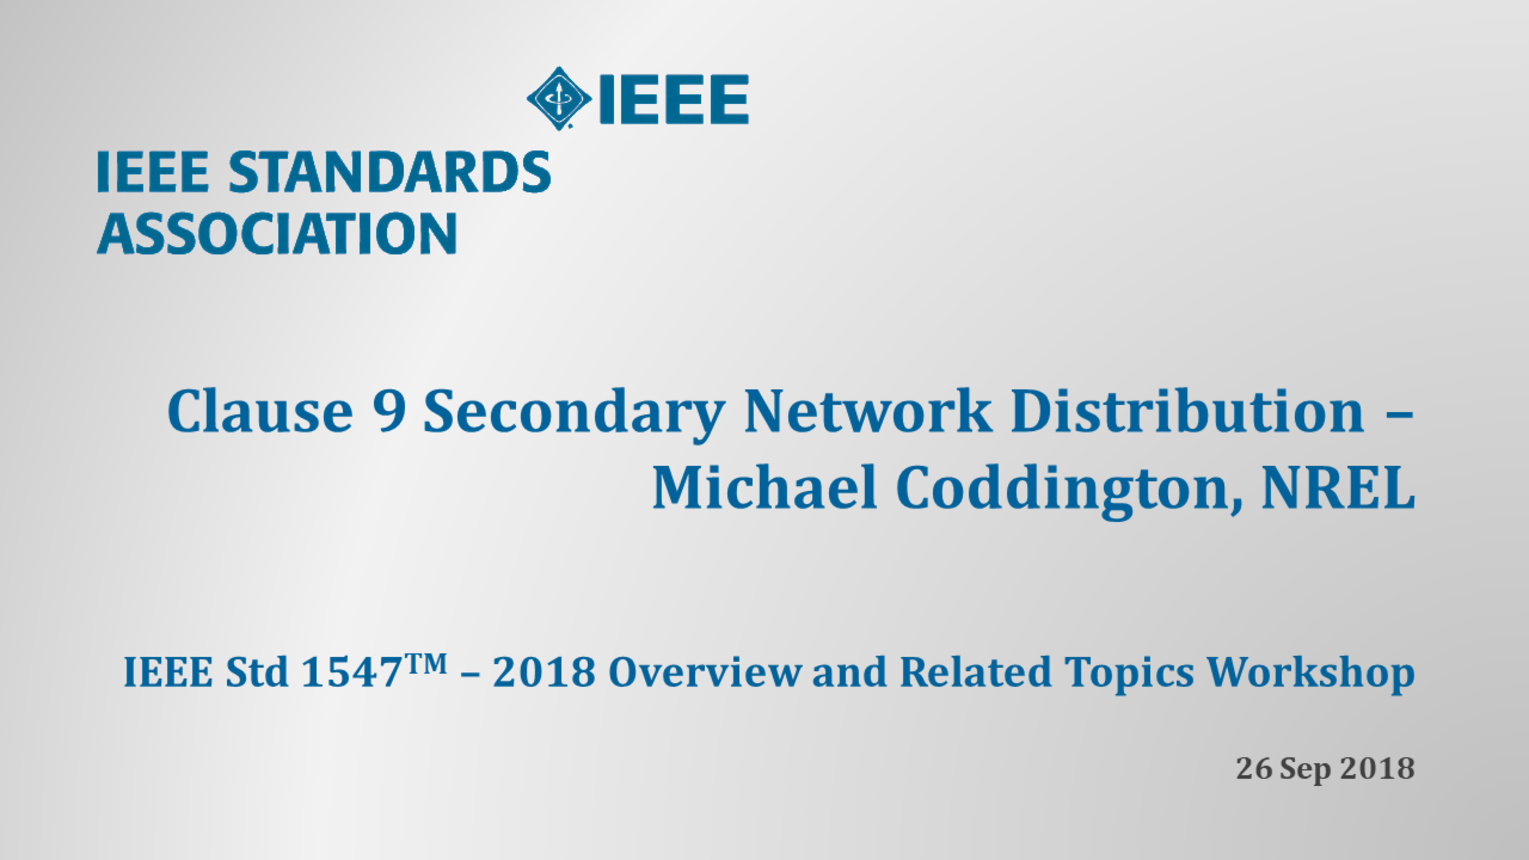 IEEE Std 1547 Workshop - NERC - Atlanta, GA - Sept. 2018: 1547 Clause 9 - Michael Coddington